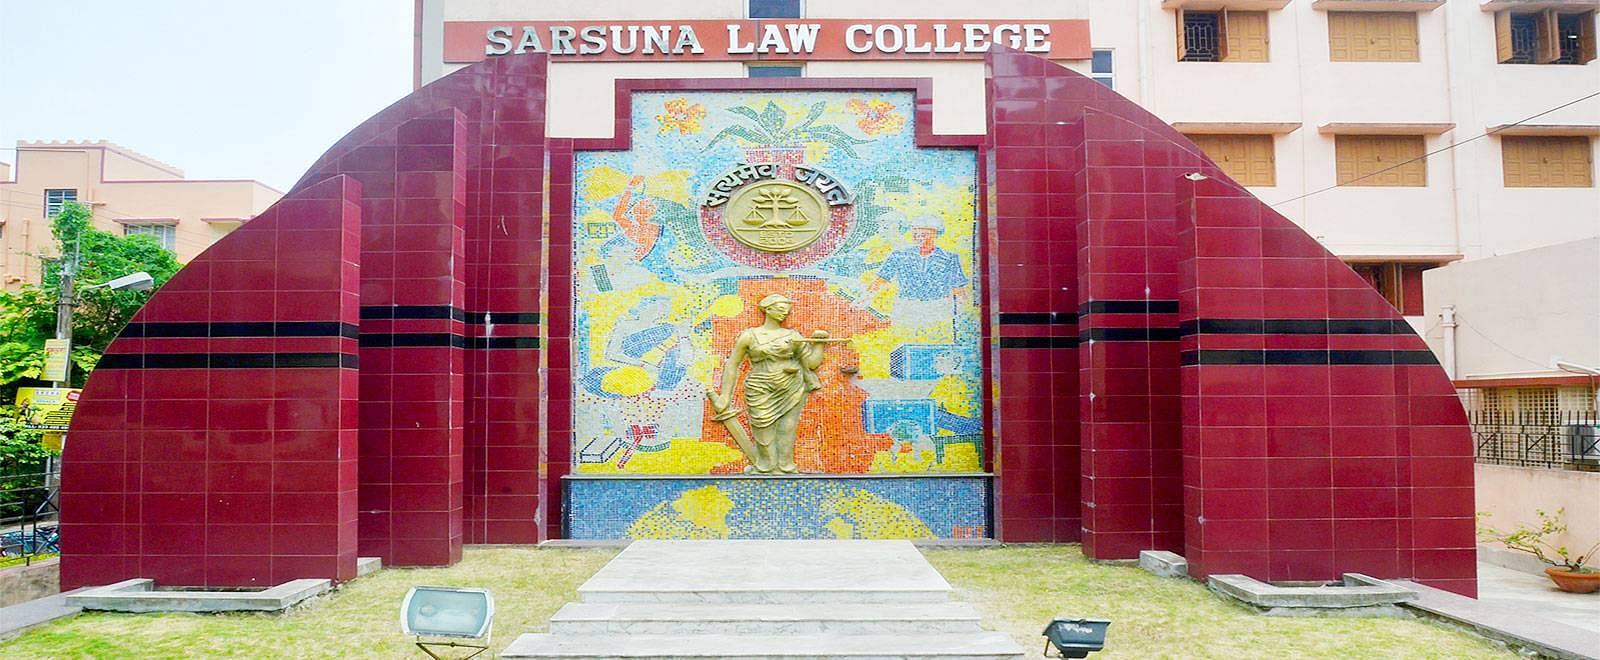 Sarsuna Law College